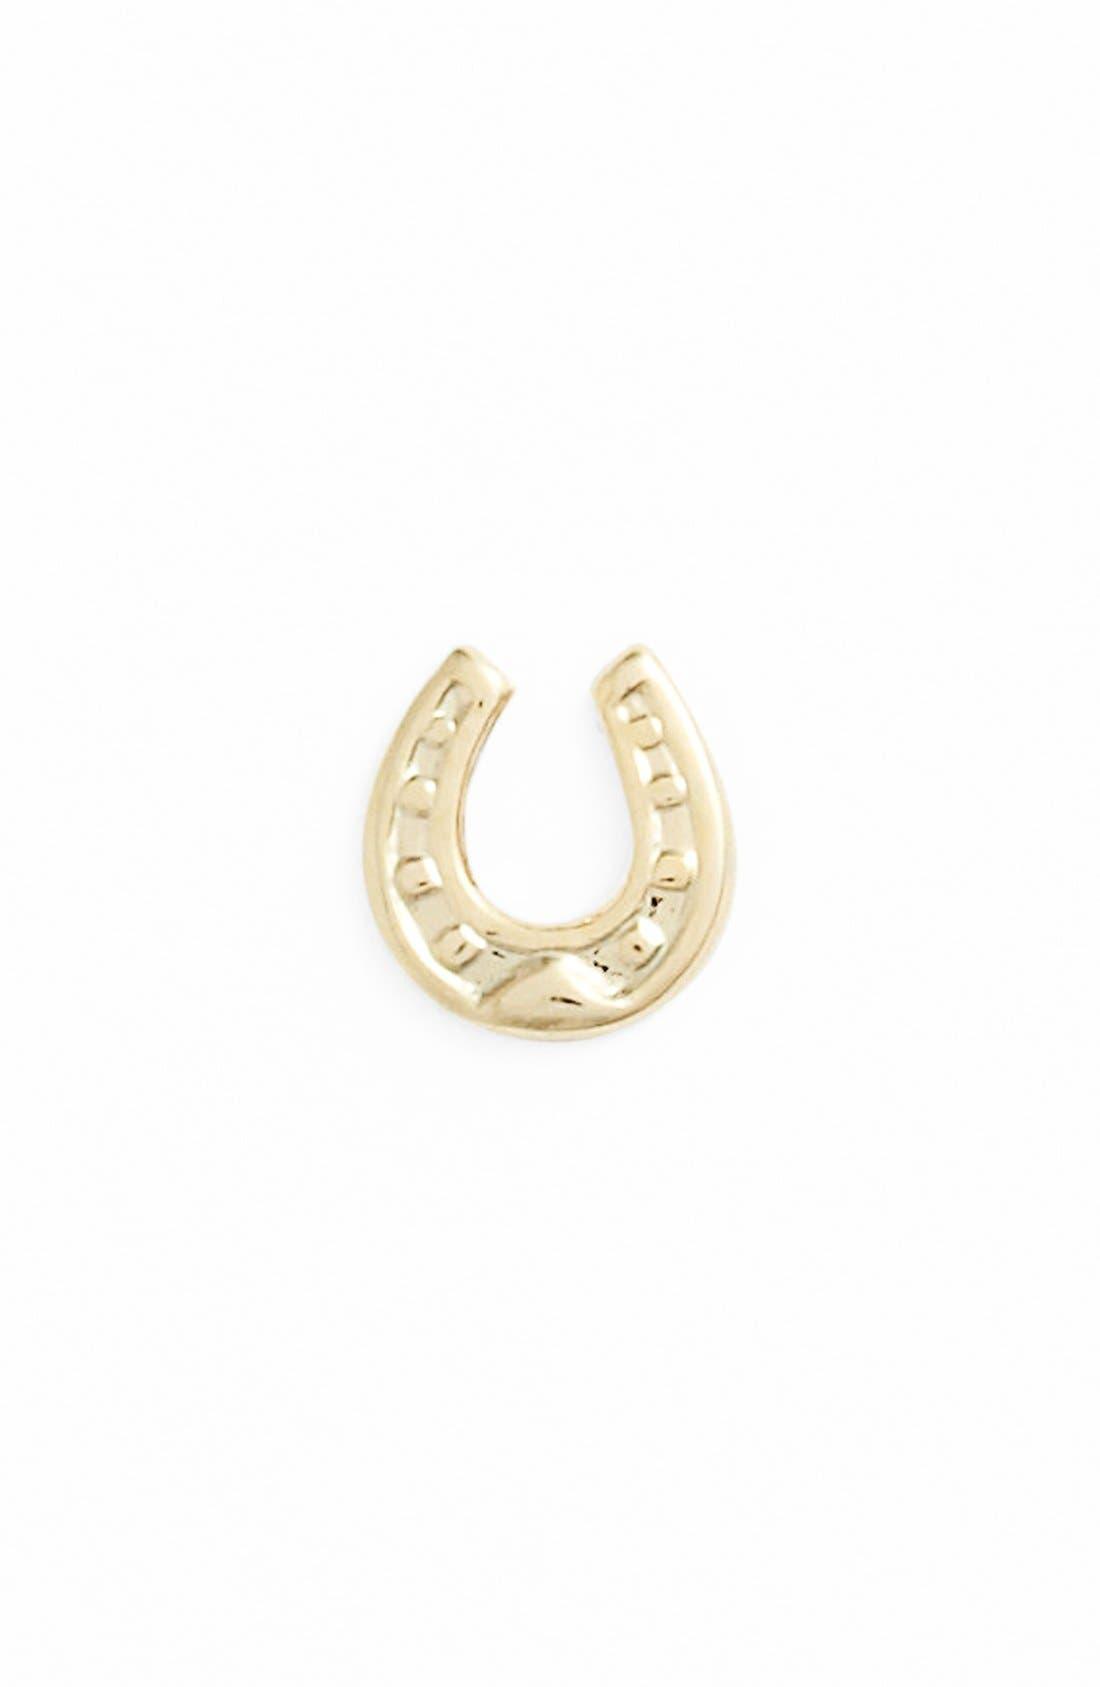 Alternate Image 1 Selected - Bonnie Jonas 'Horseshoe' Stud Earring